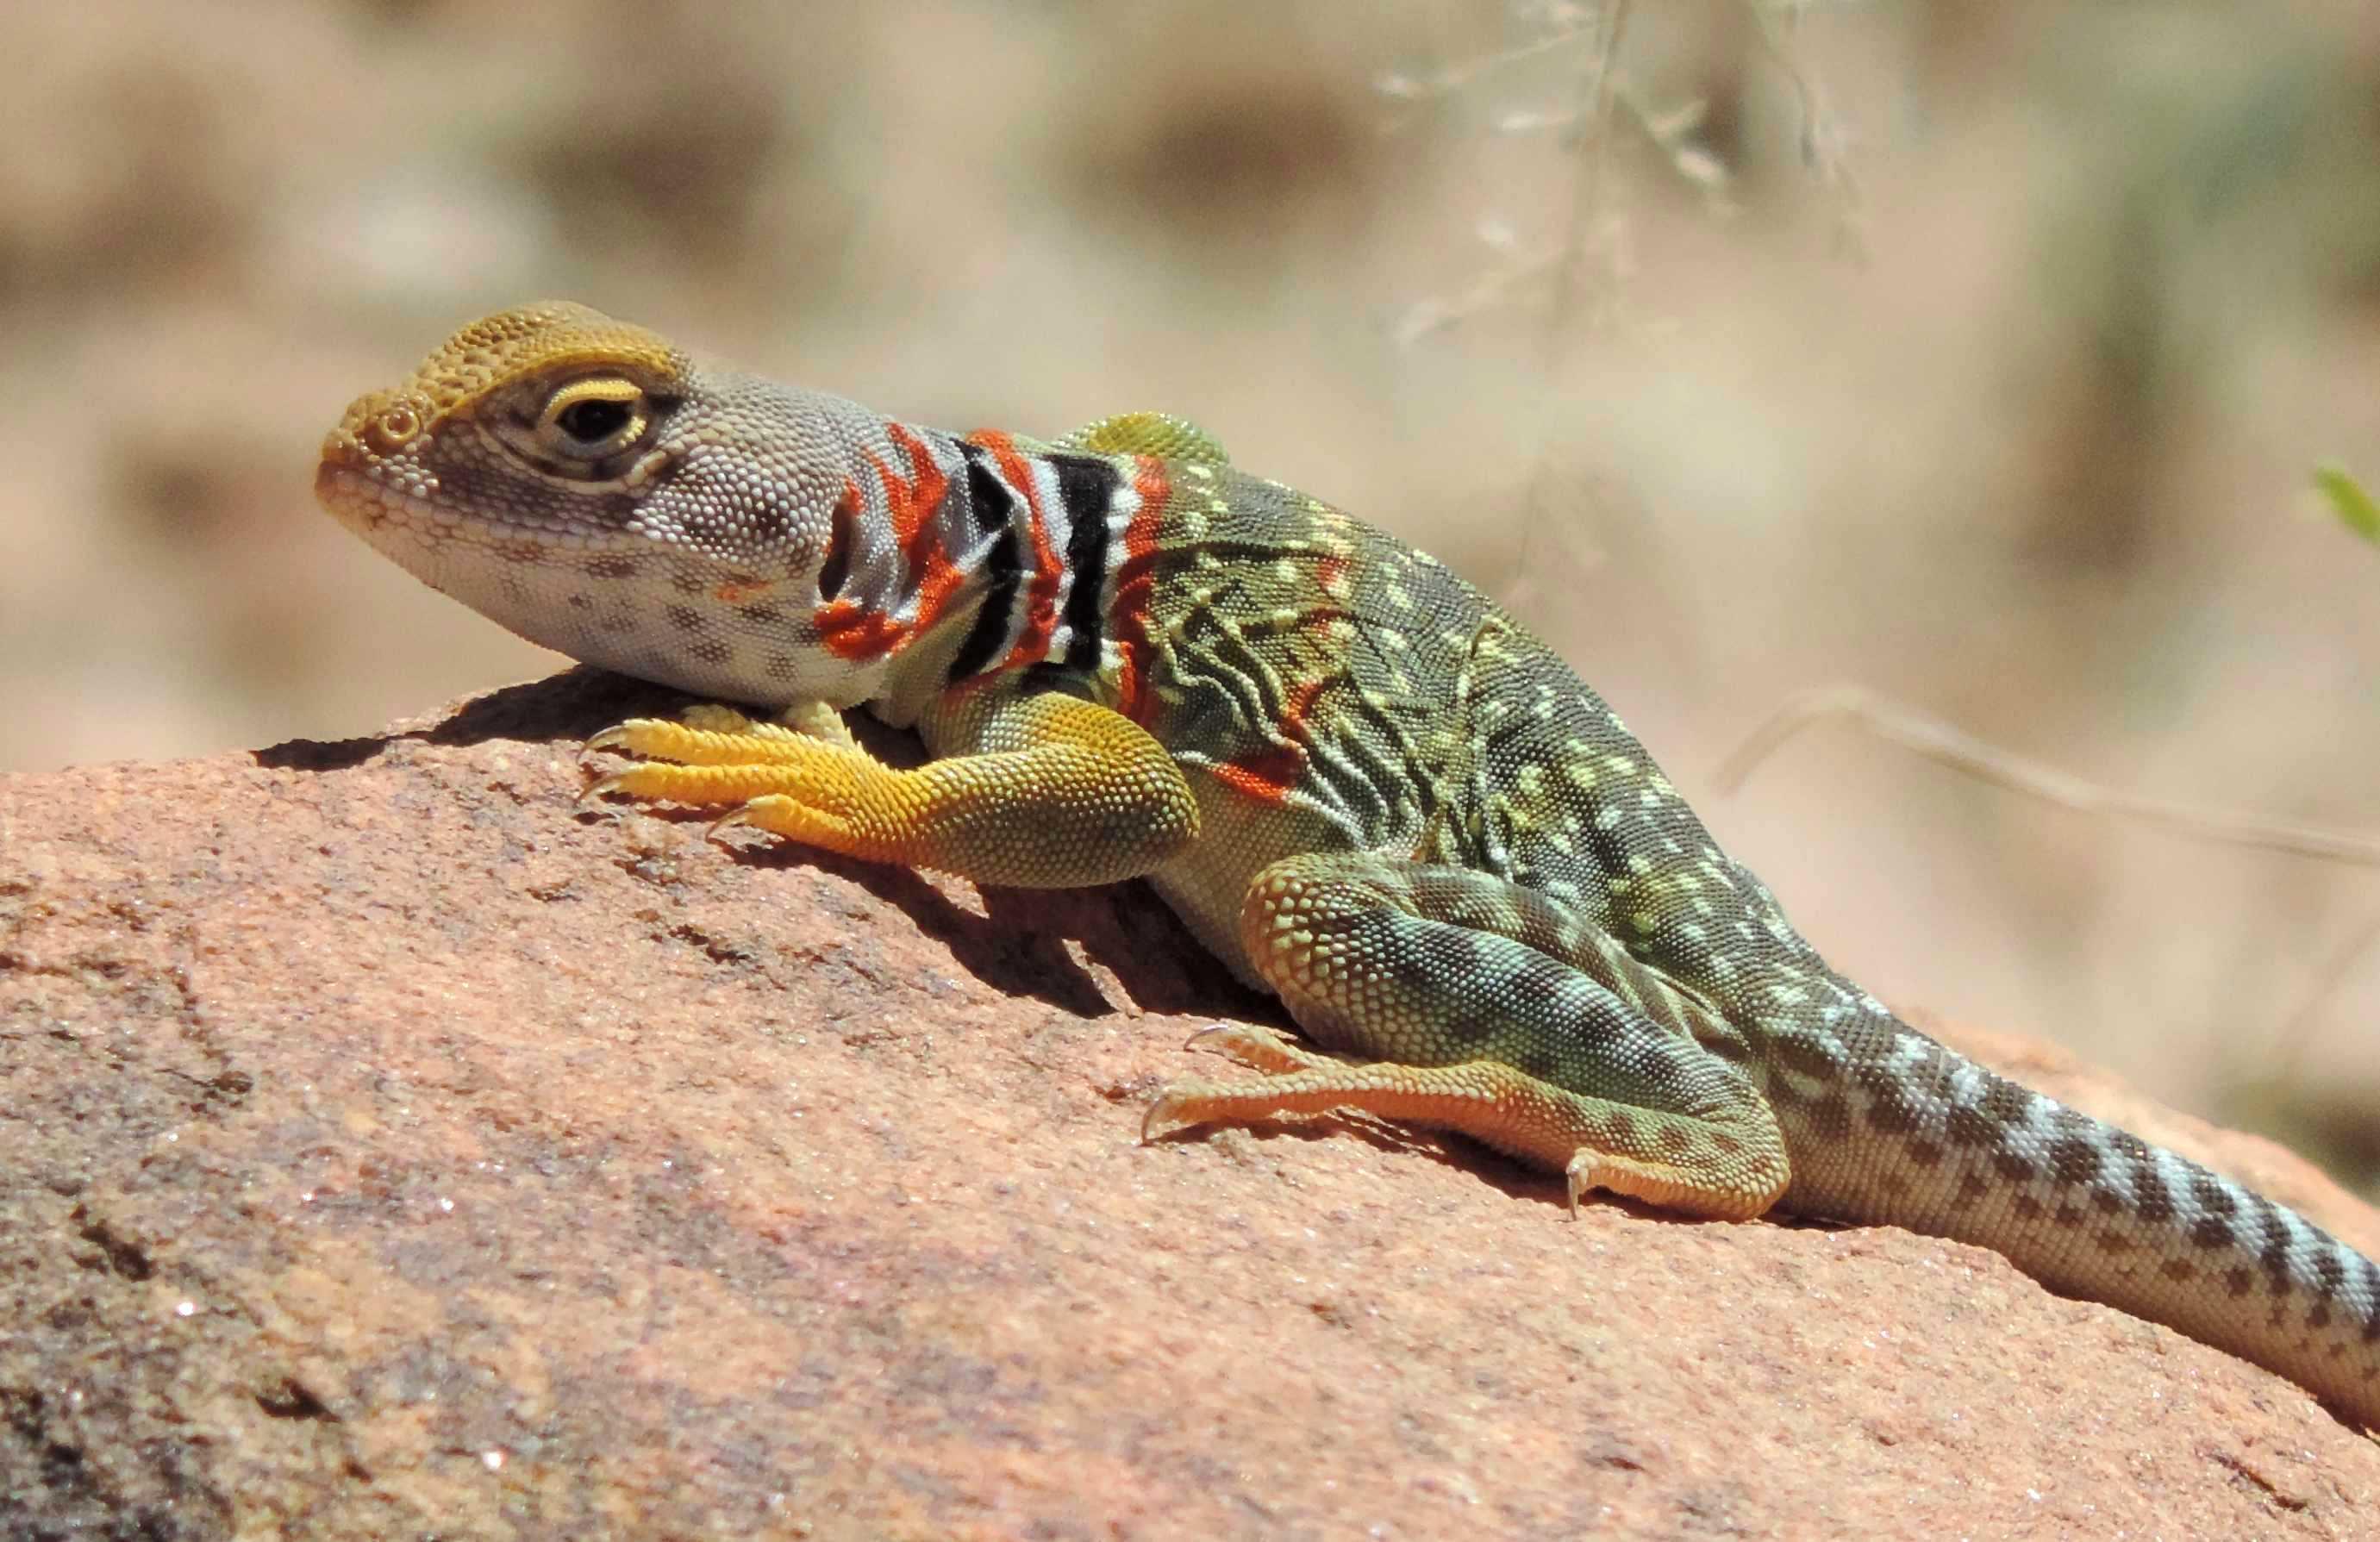 Collared lizard photo